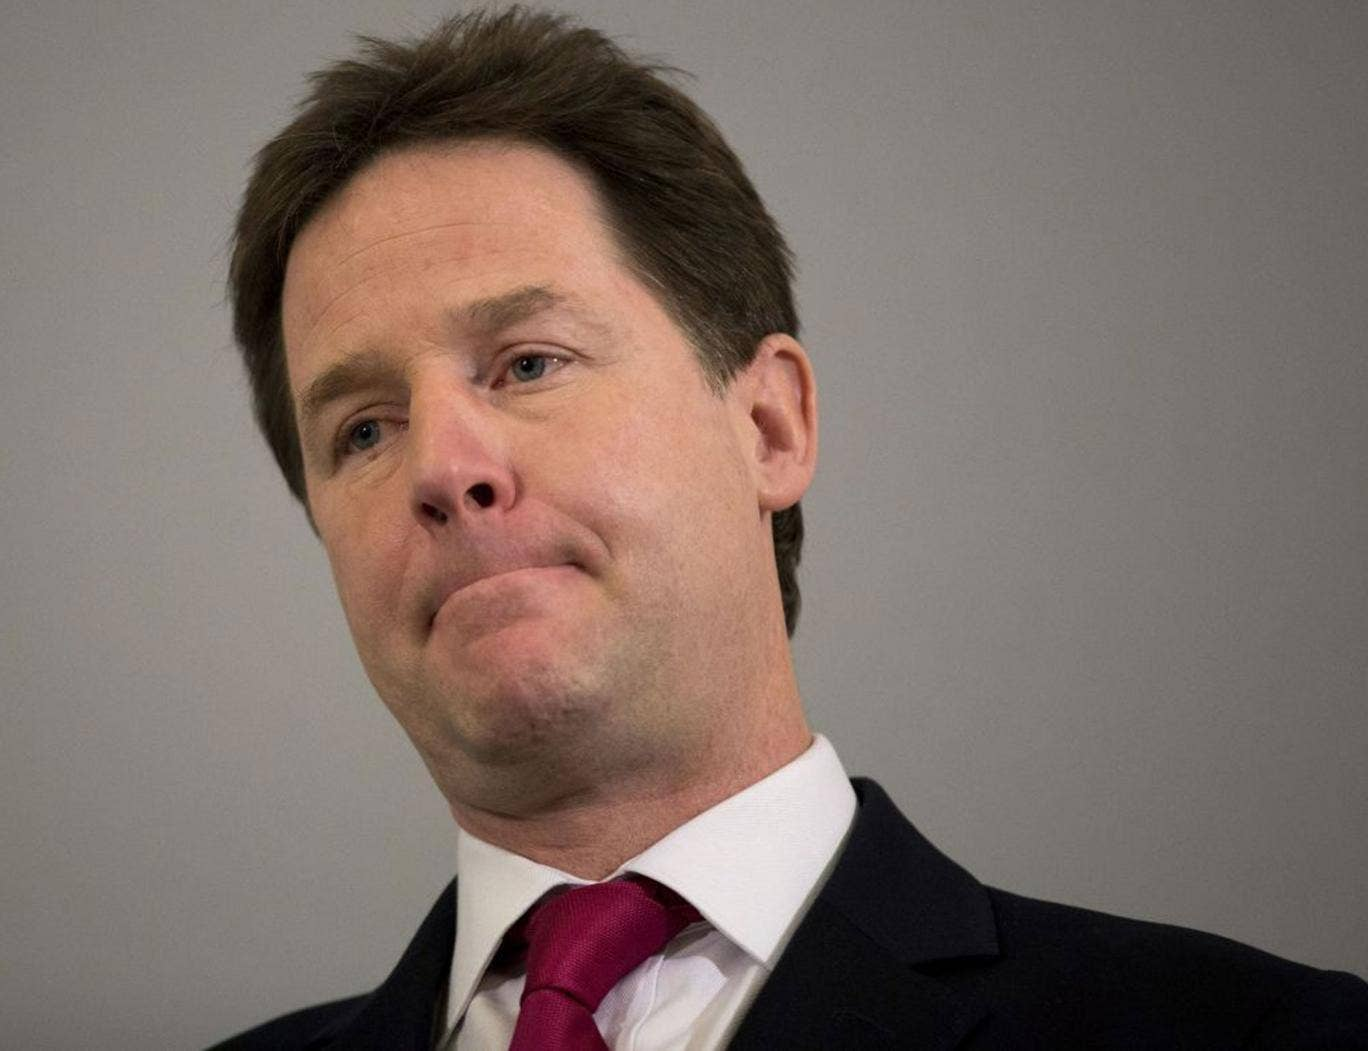 Nick Clegg's ratings amongst Liberal Democrat activists have slumped